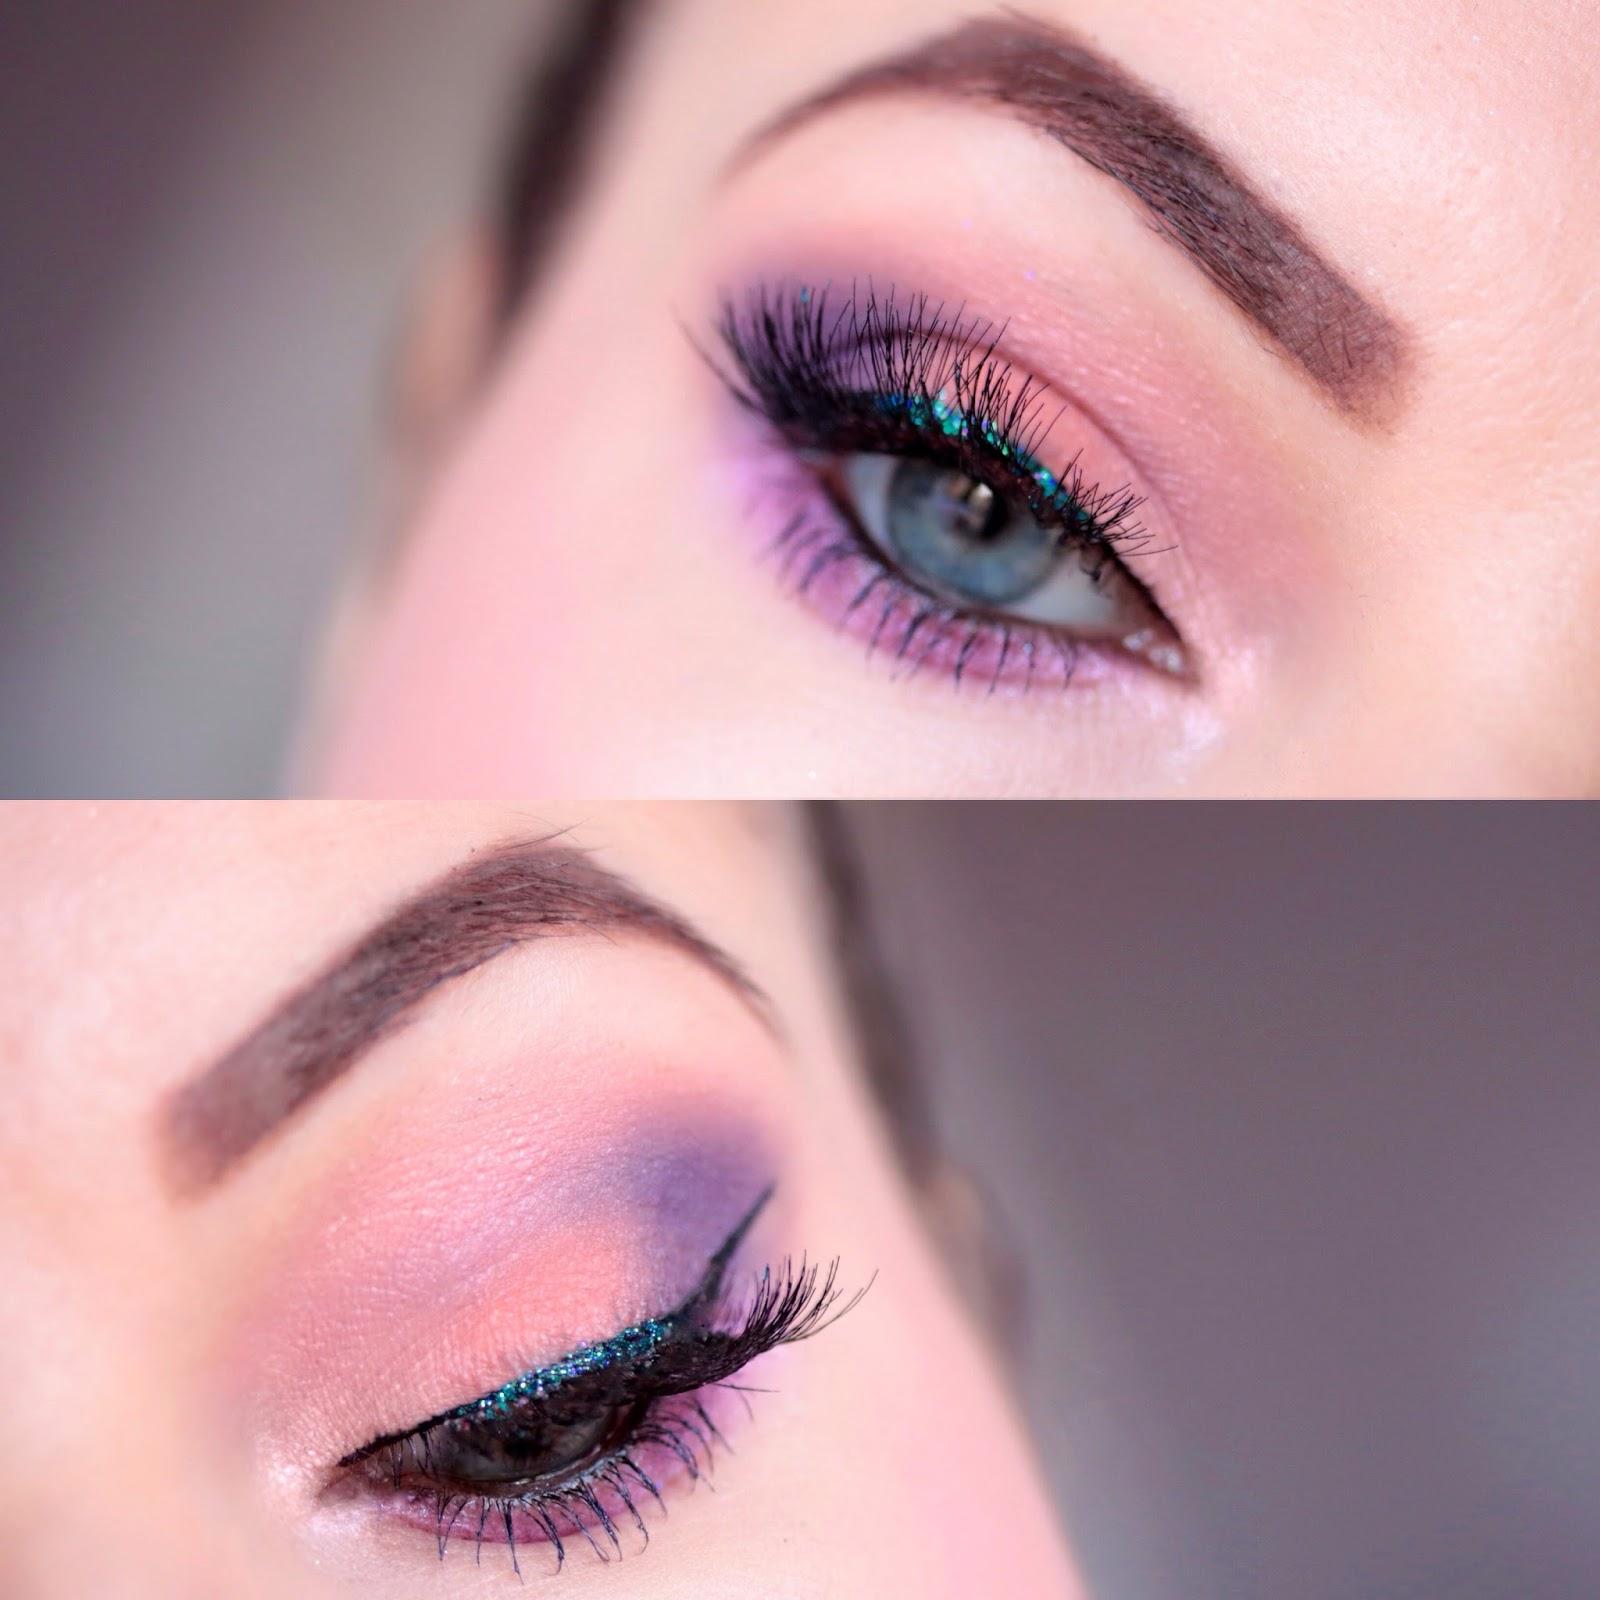 Łosoś, Róż i Fiolet - Inglot Makeup